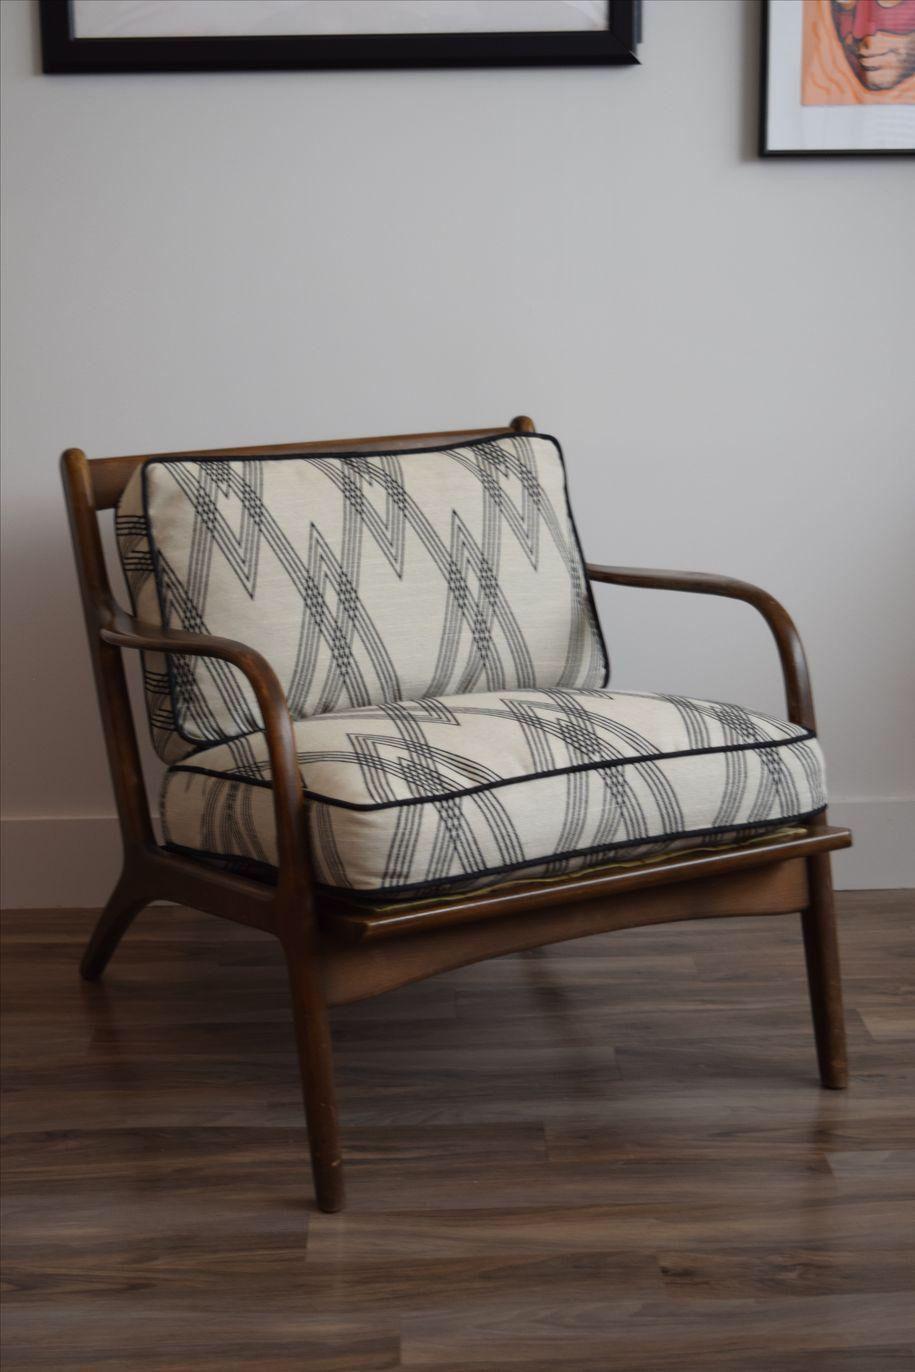 Best Mid Century Modern Upholstered Arm Chair On Chairish Com 640 x 480